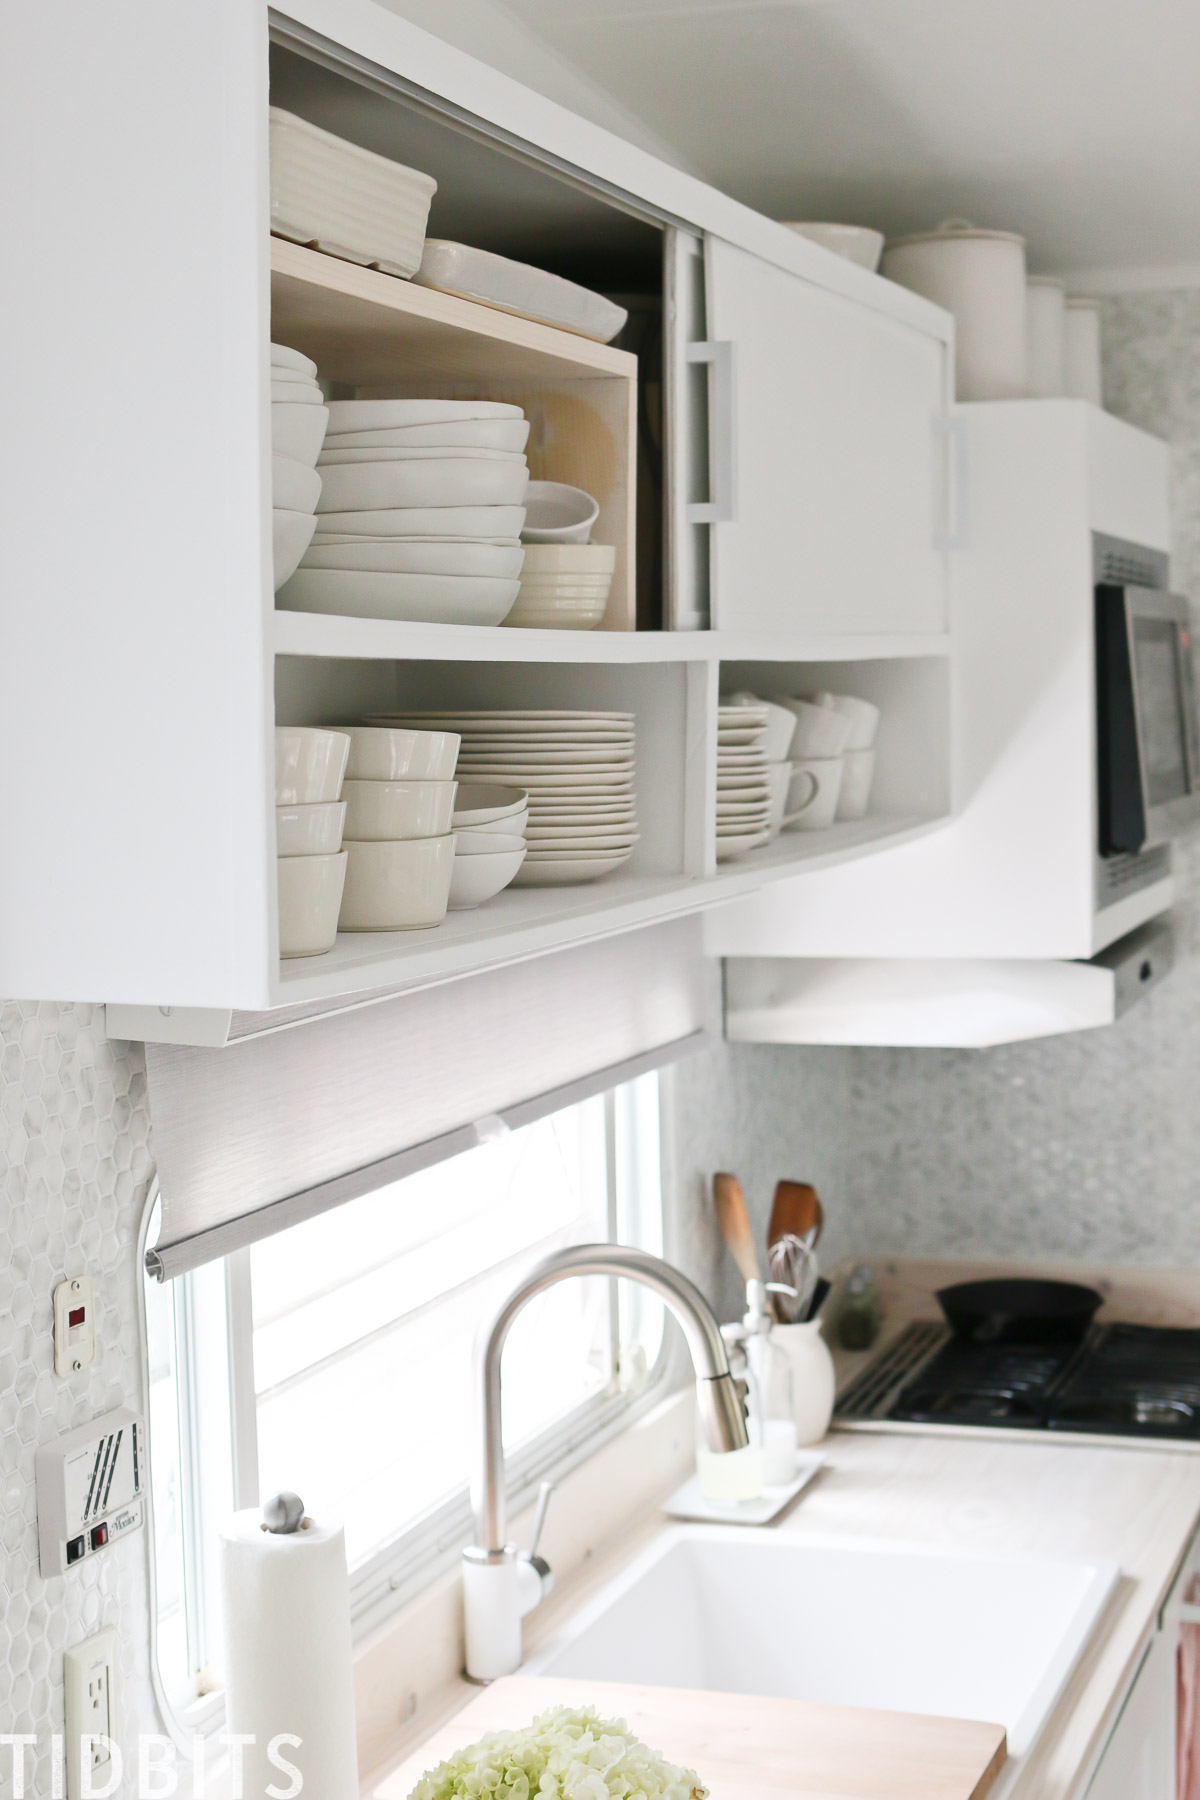 DIY cabinet shelf risers, building plans.